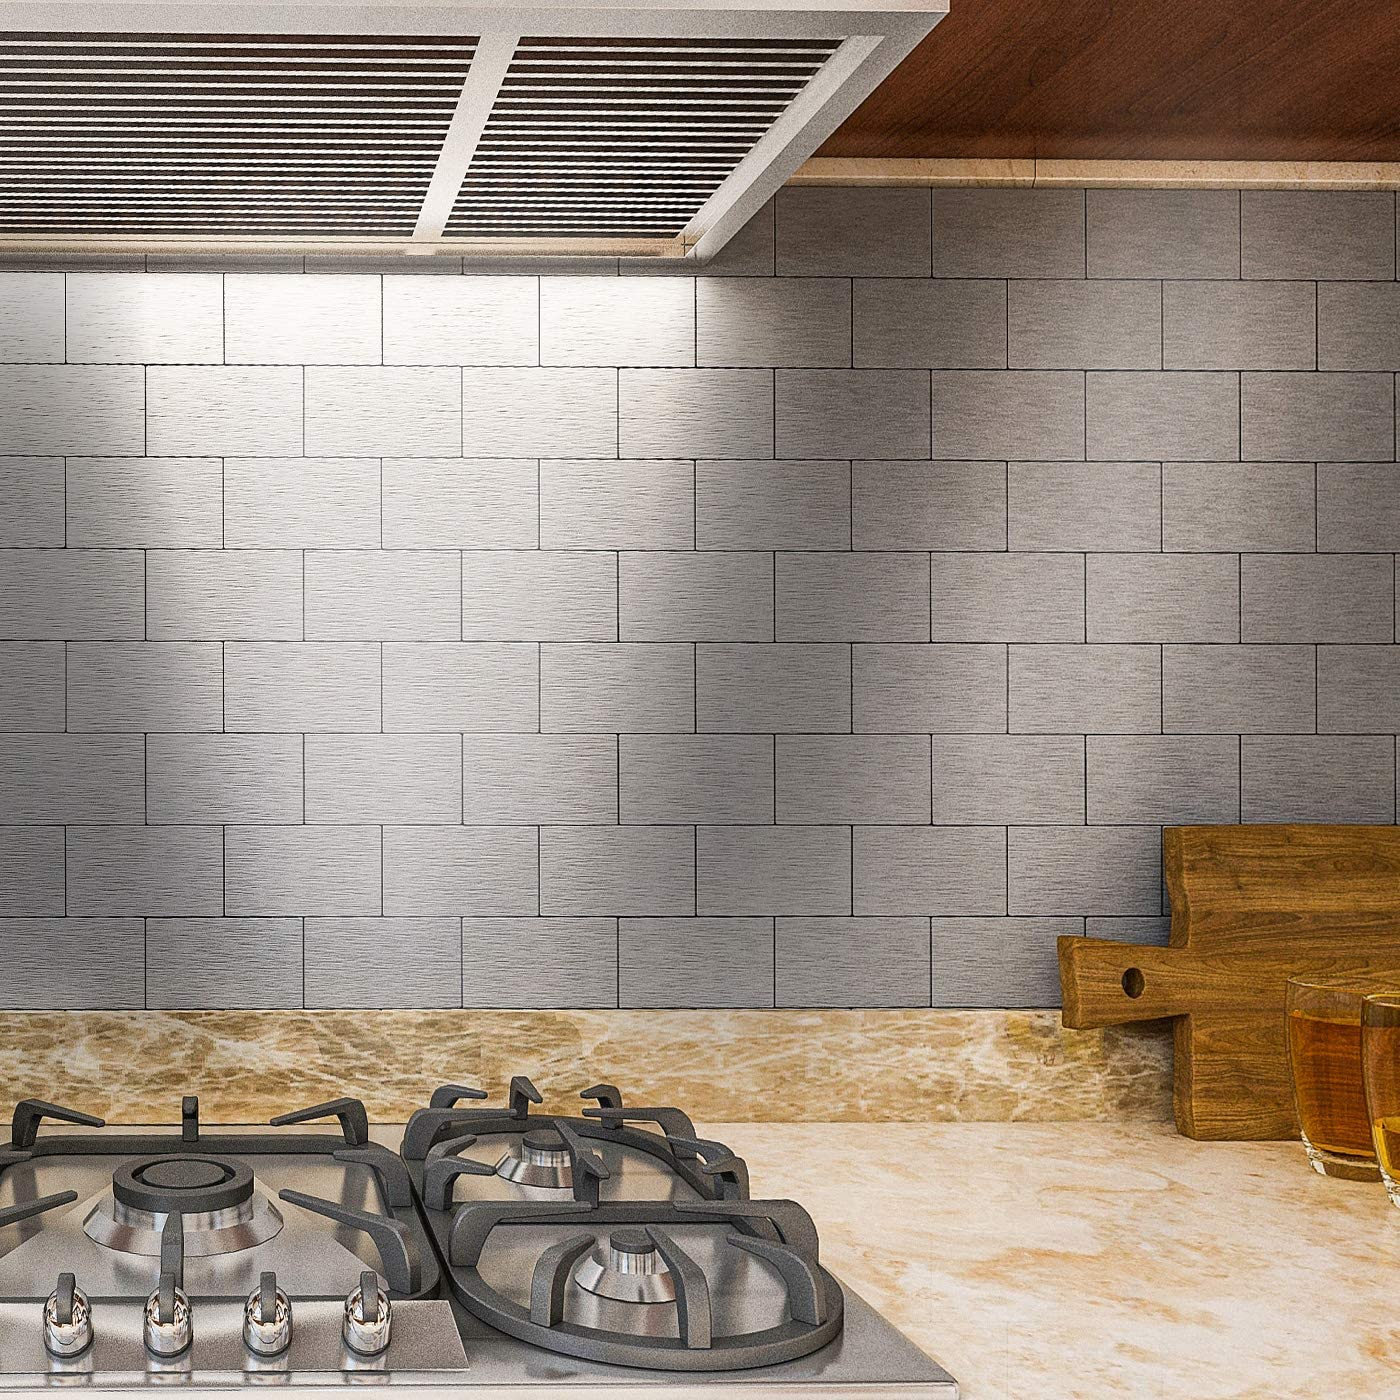 Art3d 32 Piece Peel And Stick Backsplash Tiles Brushed Metal Subway Tile For Kitchen 3 X6 Silver Amazon Com